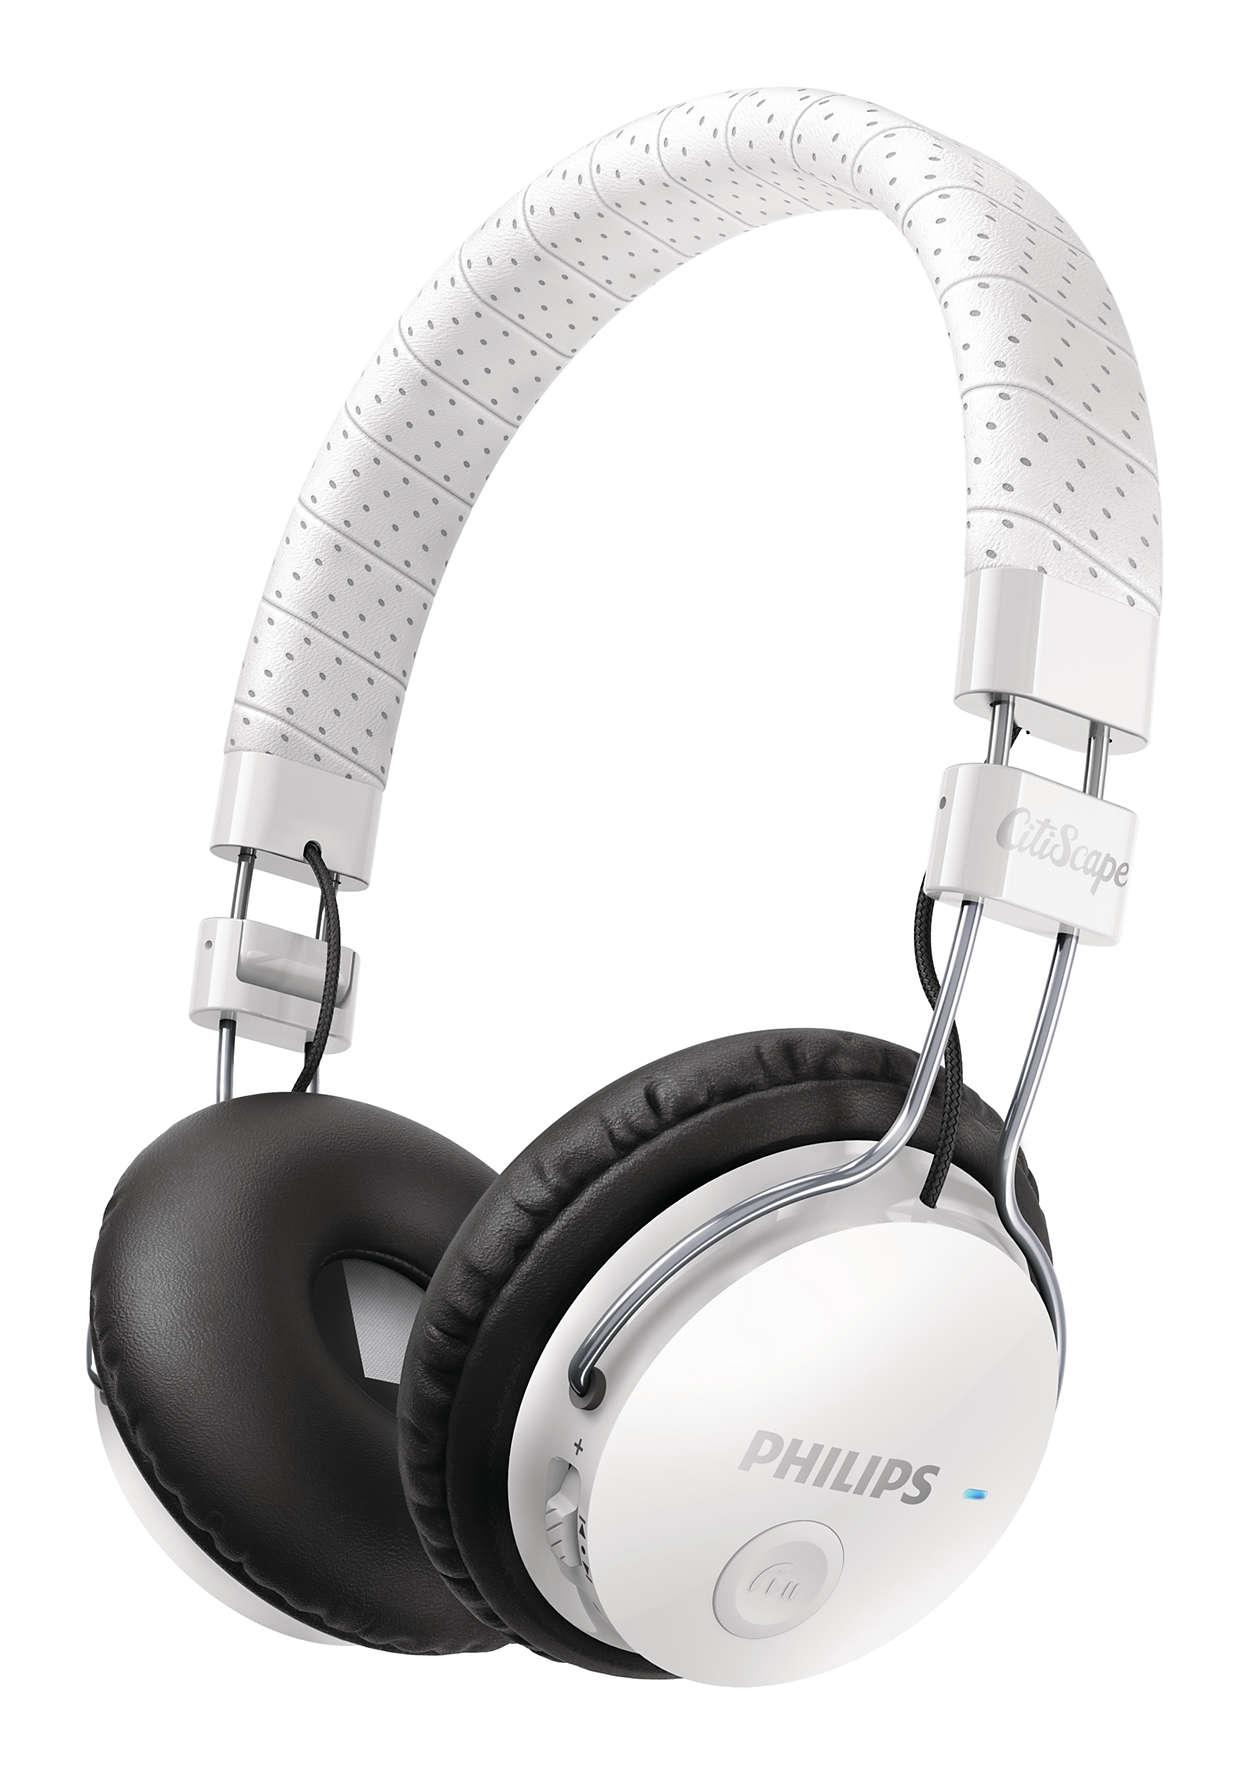 Wireless high precision sound